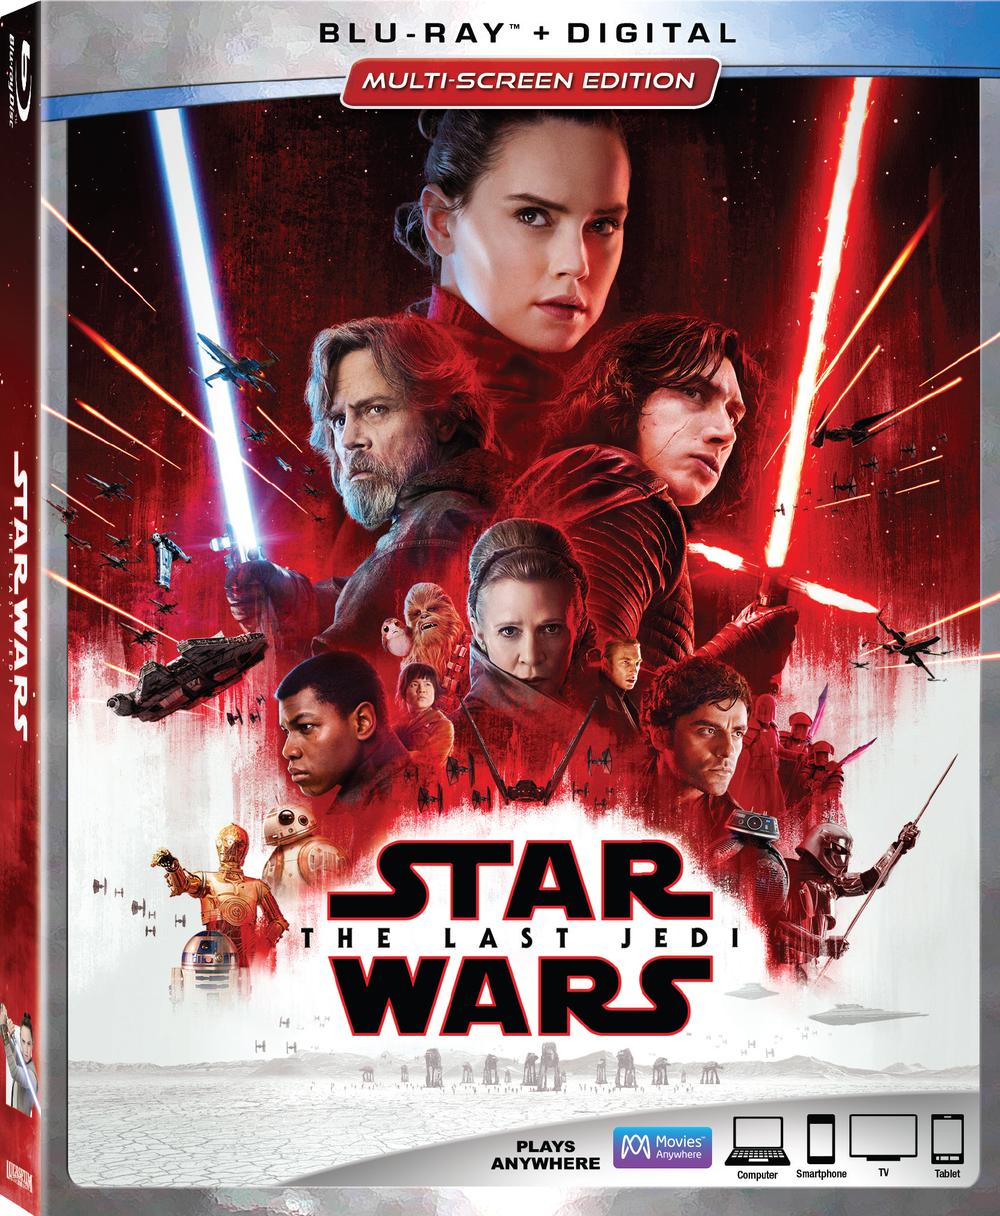 Star_Wars-_The_Last_Jedi=Print=Beauty_Shots=Beauty_Shot_Guide===US=Blu-ray.png